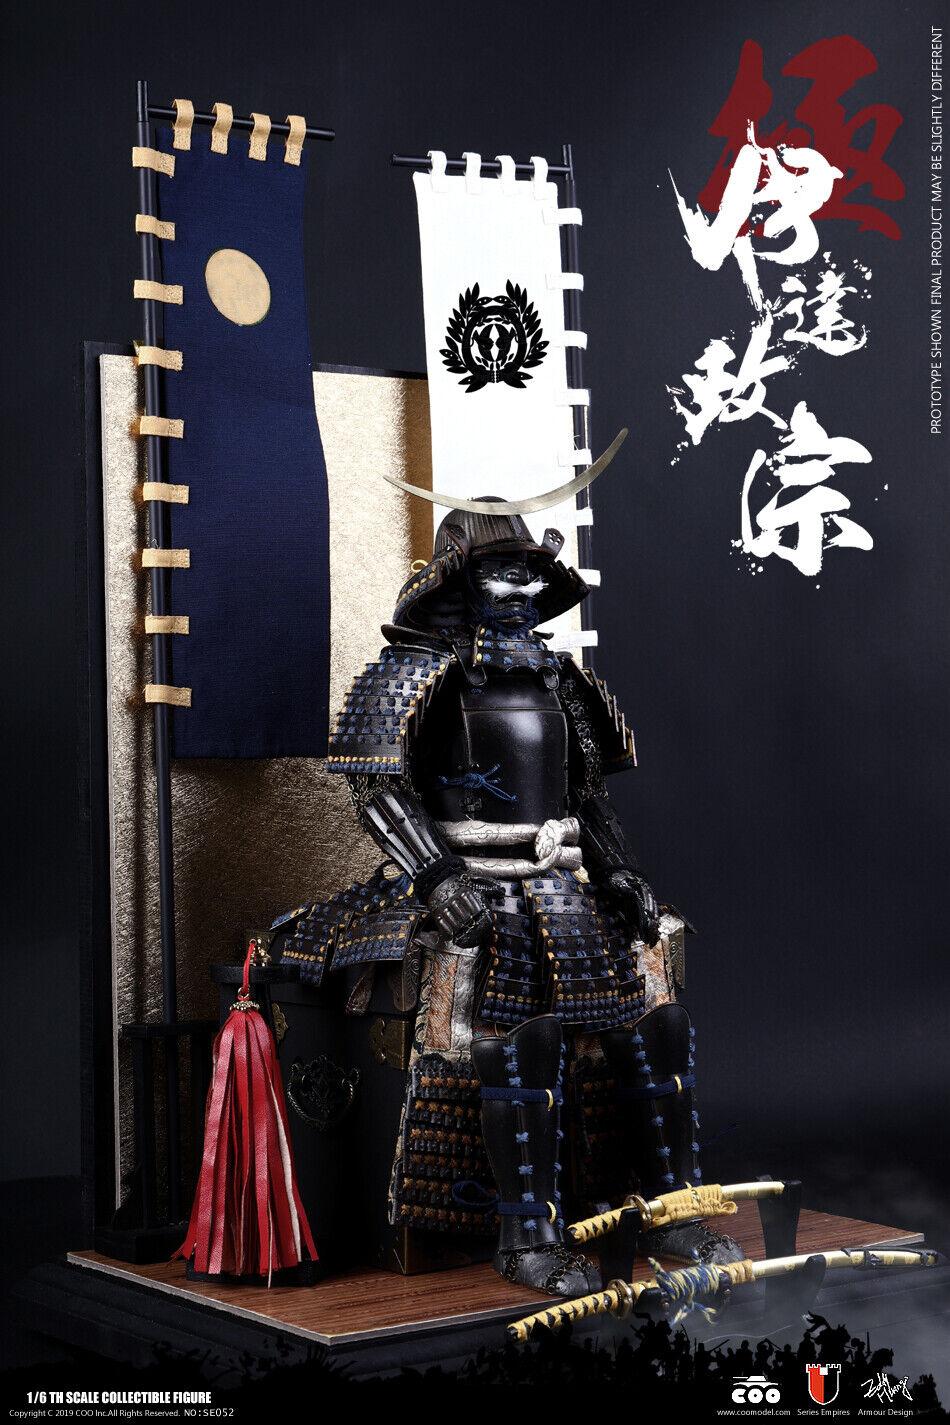 COOMODEL 1 6 SERIES OF EMPIRES  DATE MASAMUNE SE052 Masterpiece Unique Figure Toy  acheter pas cher neuf